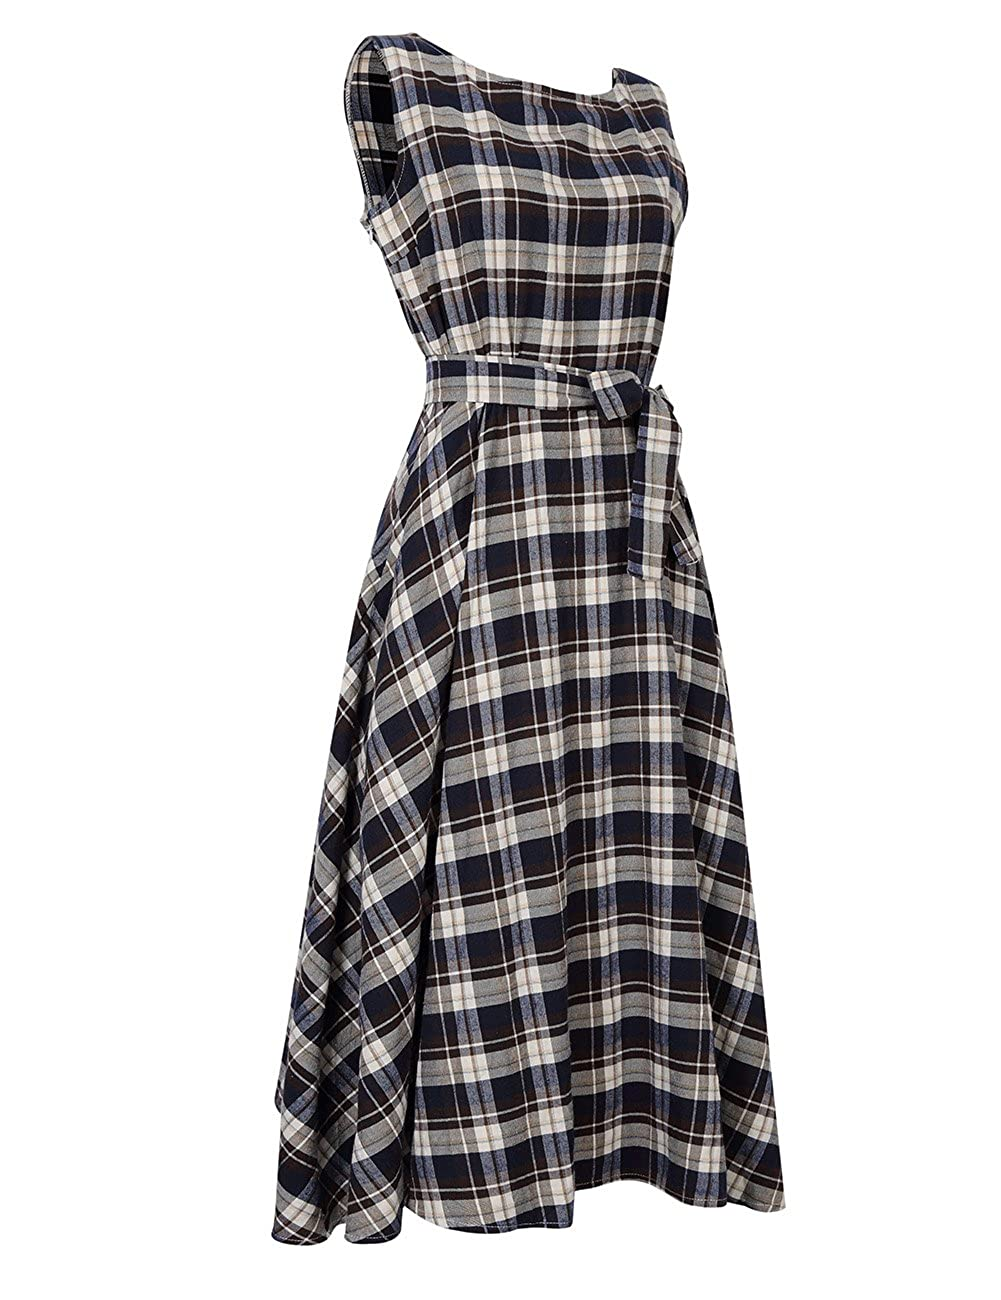 YesFashion Women/'s Vintage Plaid Rural Sleeveless Party Swing Skirt Dress